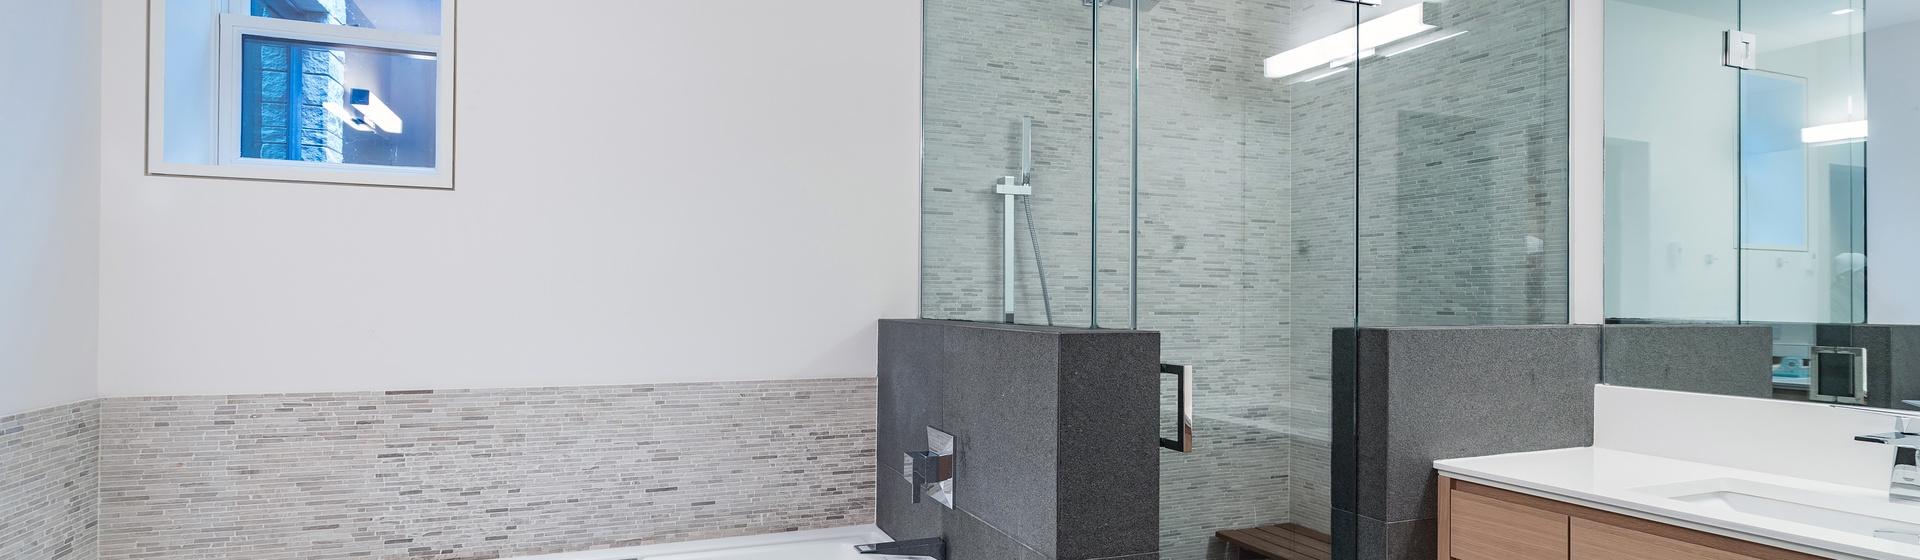 25-Telluride-The-Sunnyside-Two-Full-Bathroom-Web.jpg